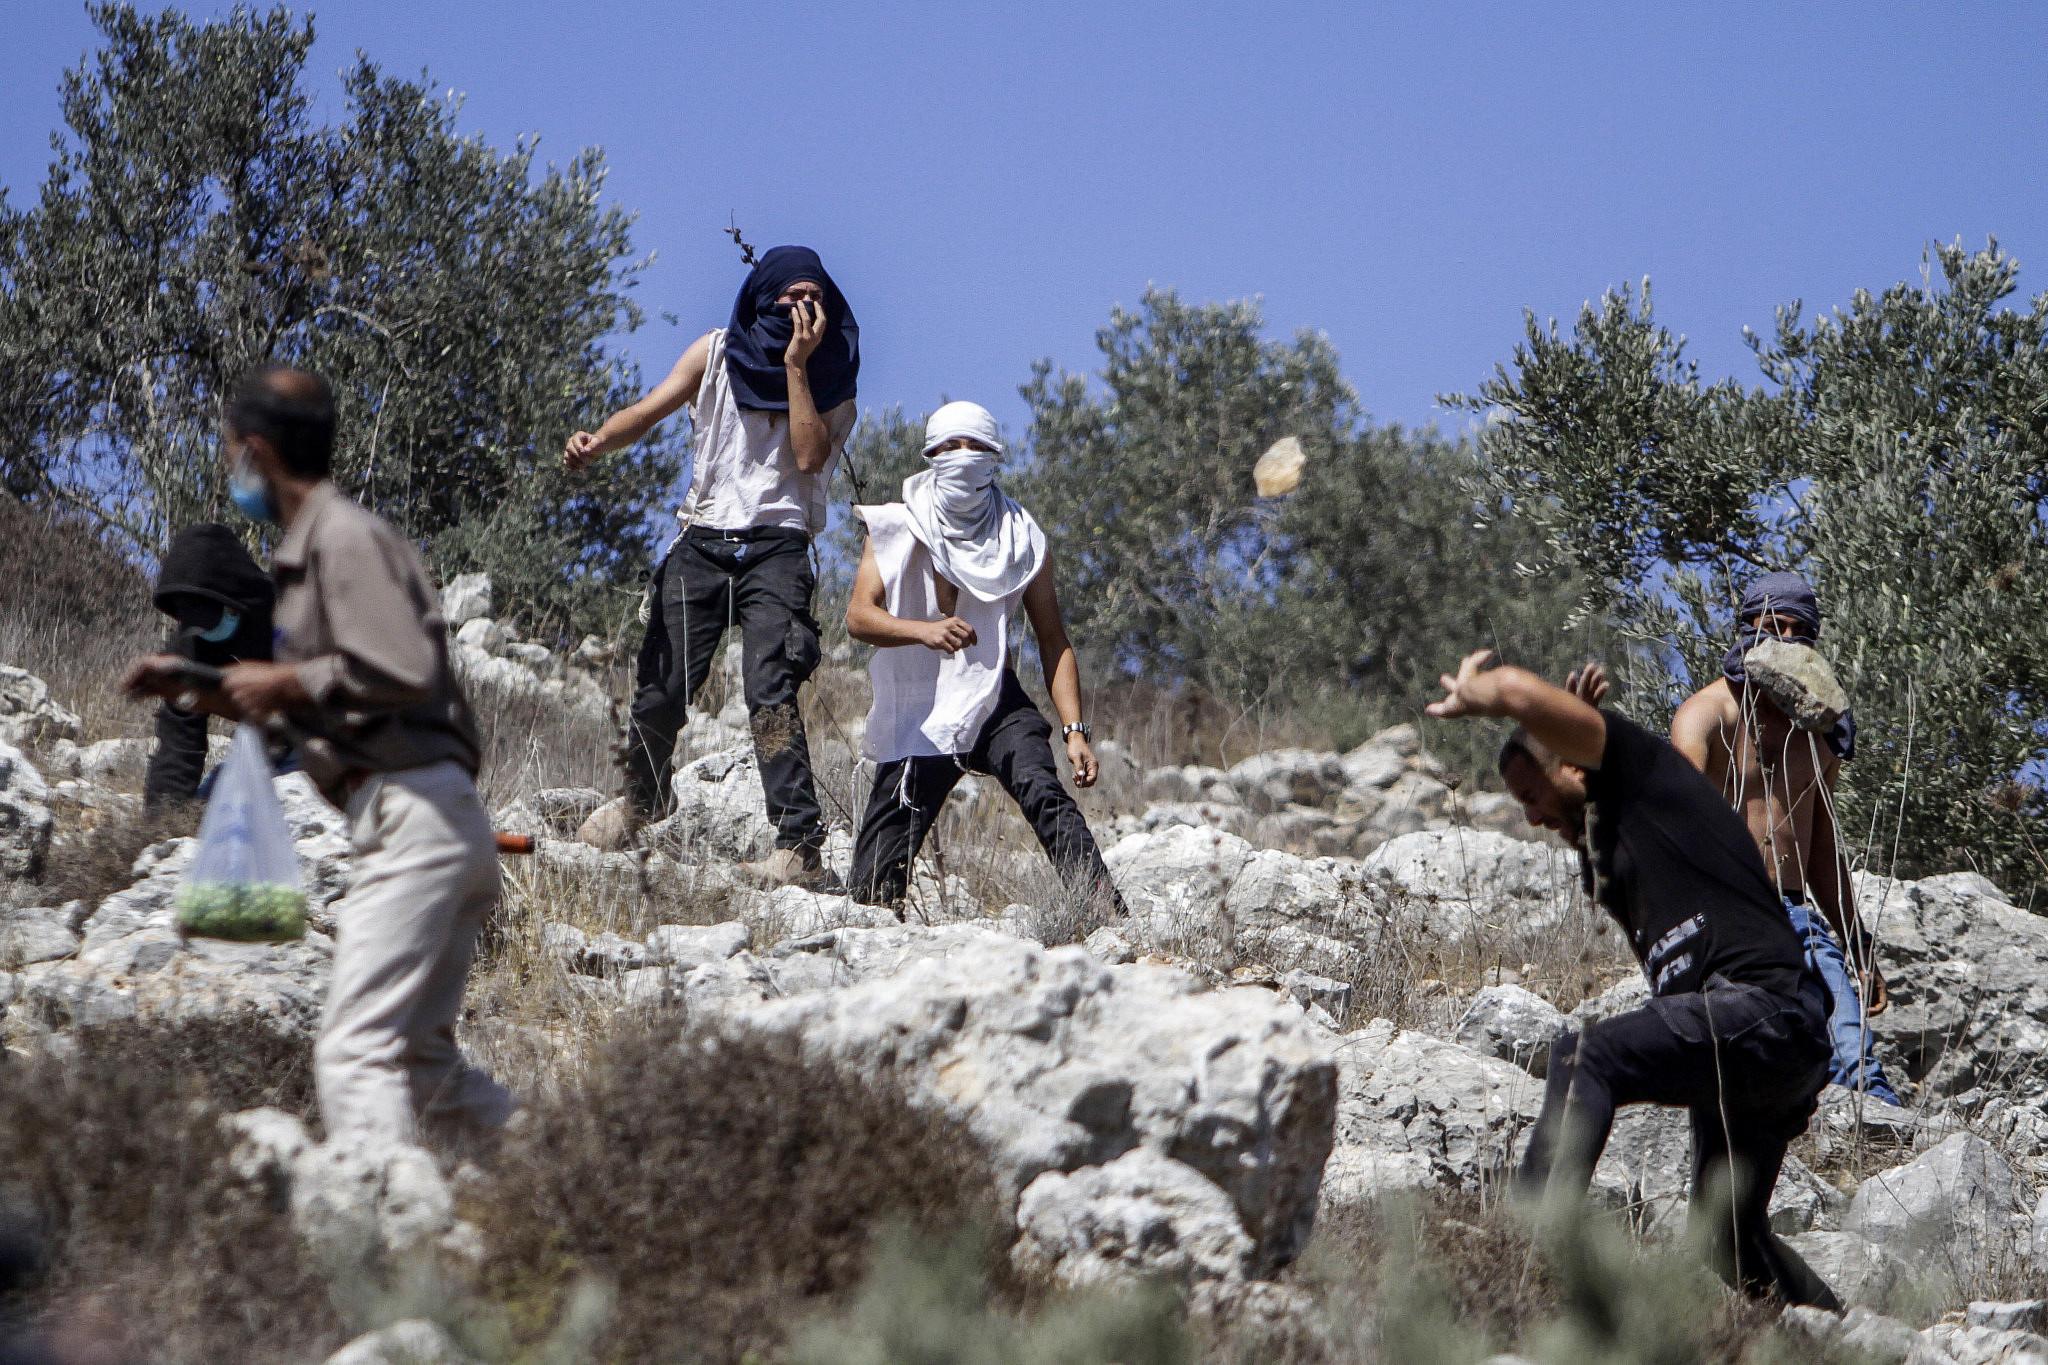 Israeli settlers hurl stones at Palestinians during the annual harvest season near the Israeli settlement of Yitzhar in the West Bank on October 7, 2020. (Nasser Ishtayeh/Flash90)